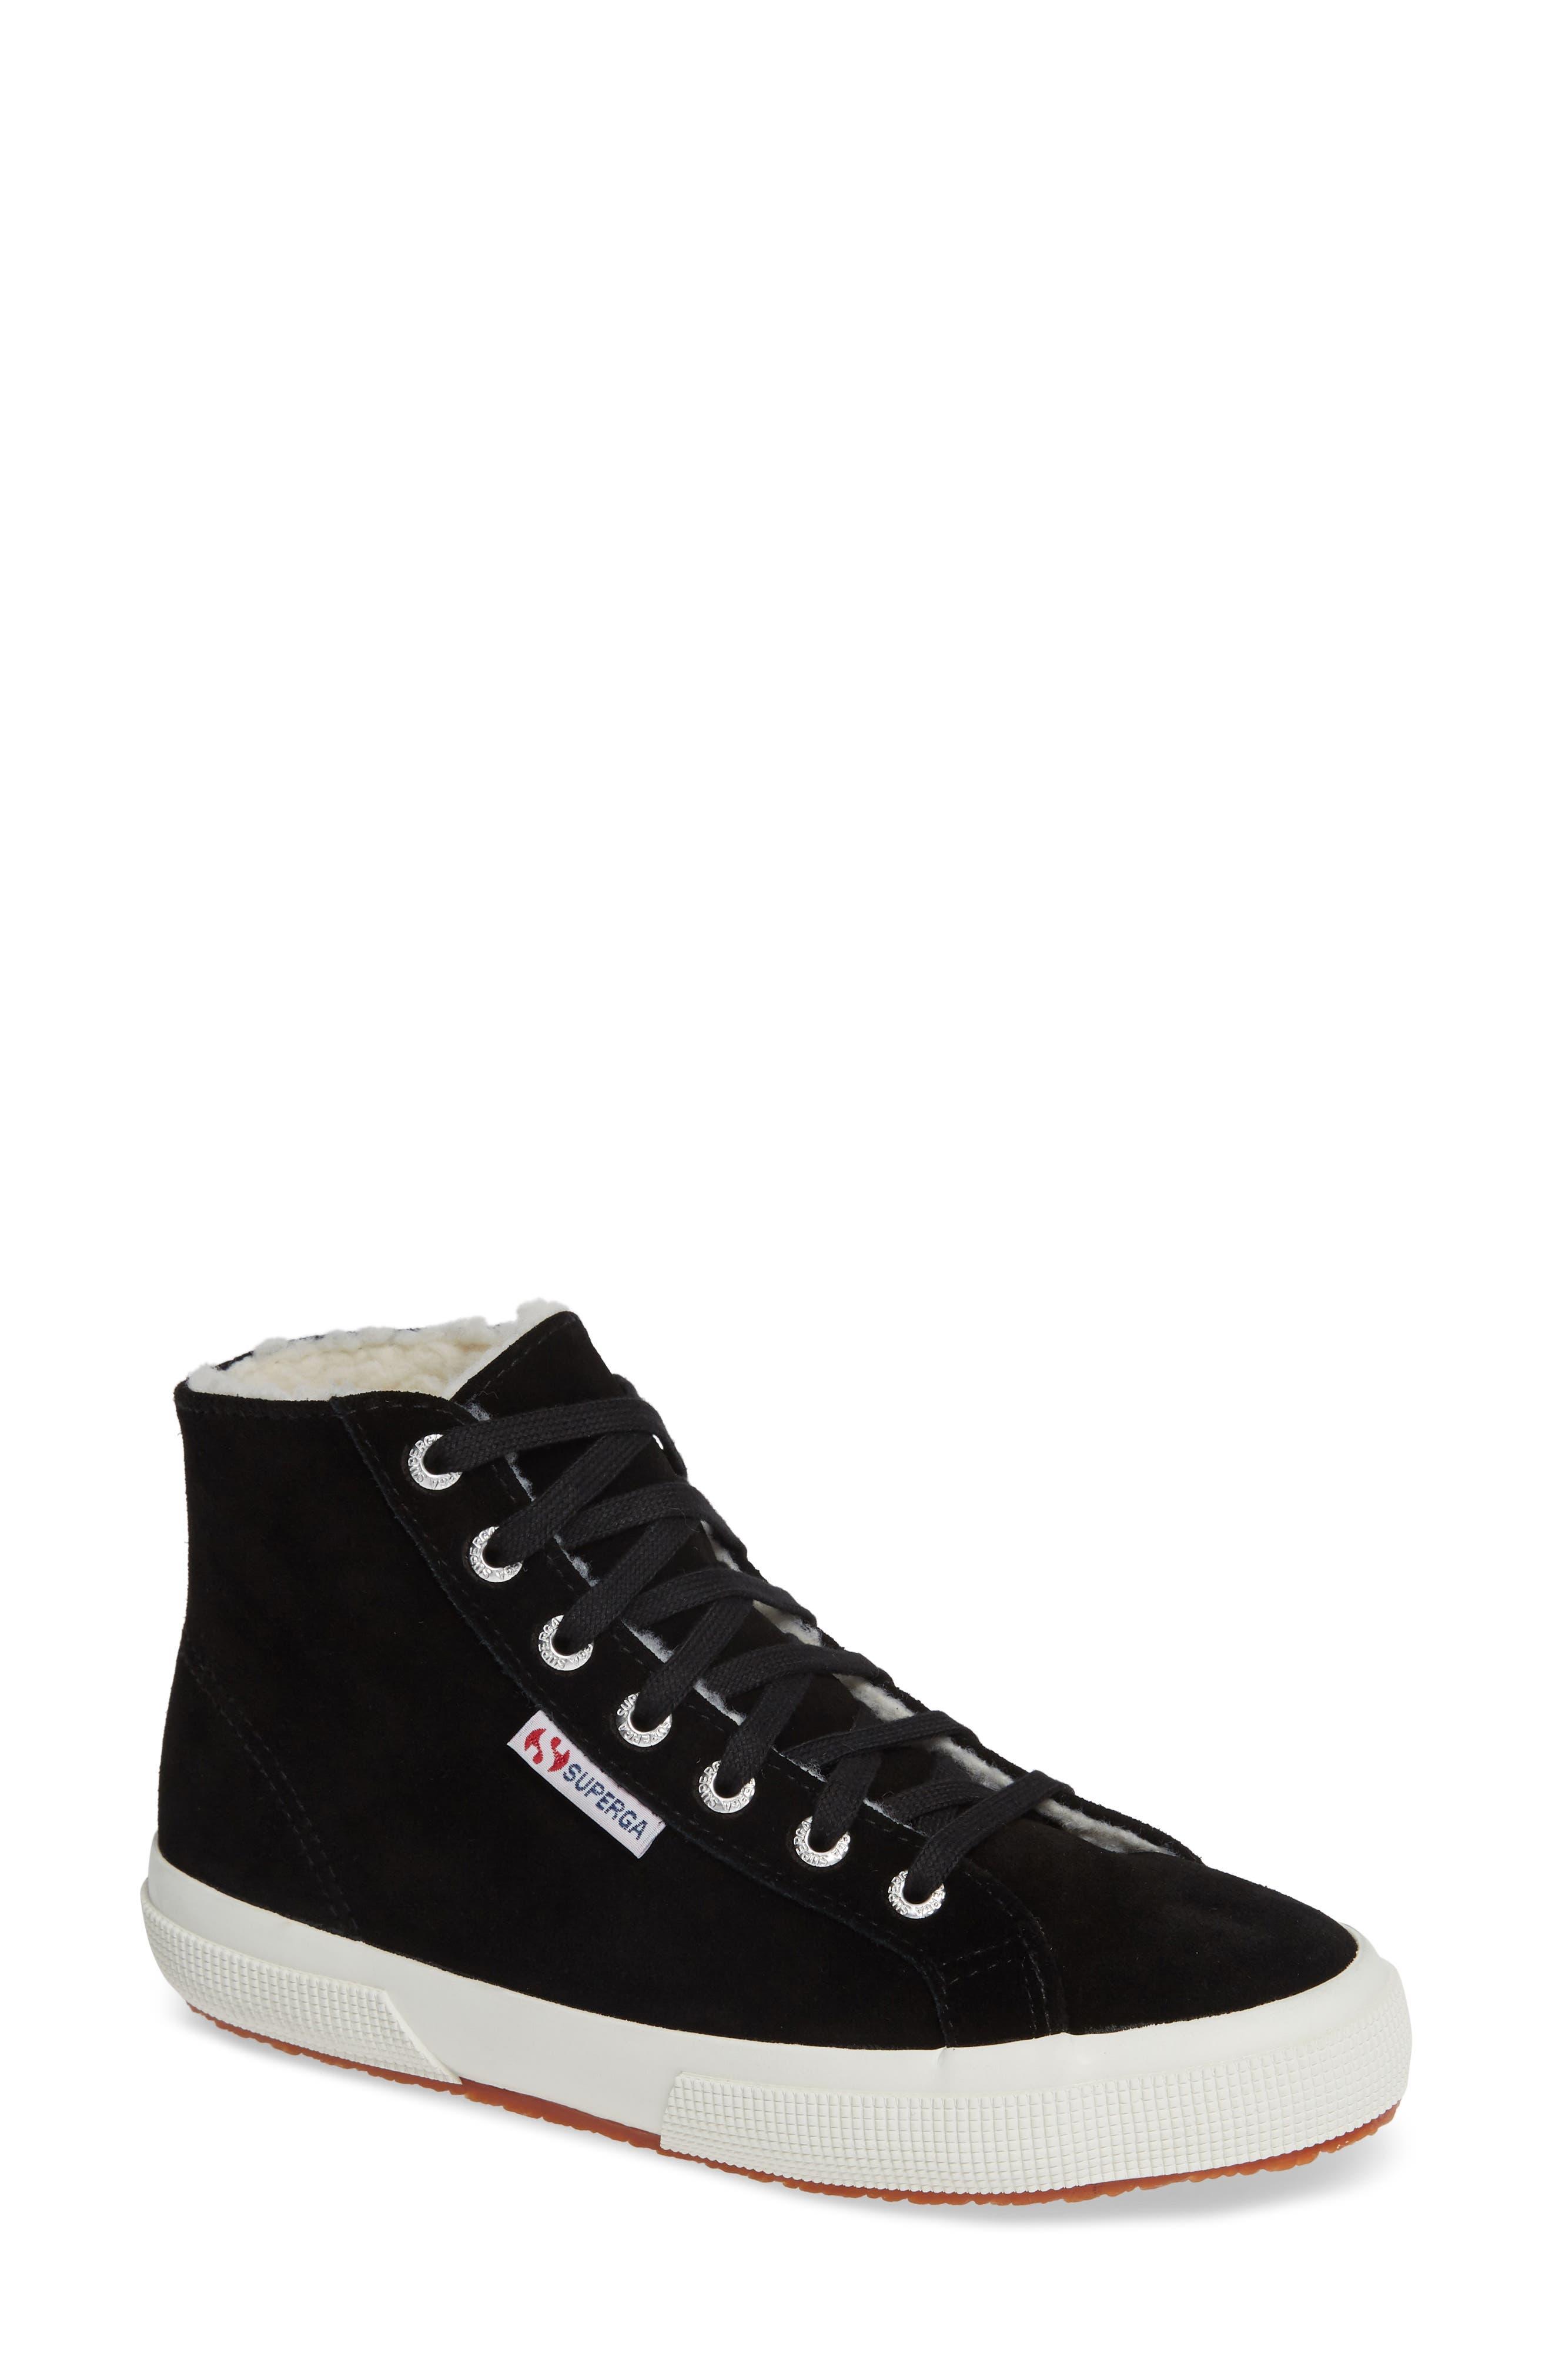 2795 Suefurw High Top Sneaker,                             Main thumbnail 1, color,                             BLACK SUEDE